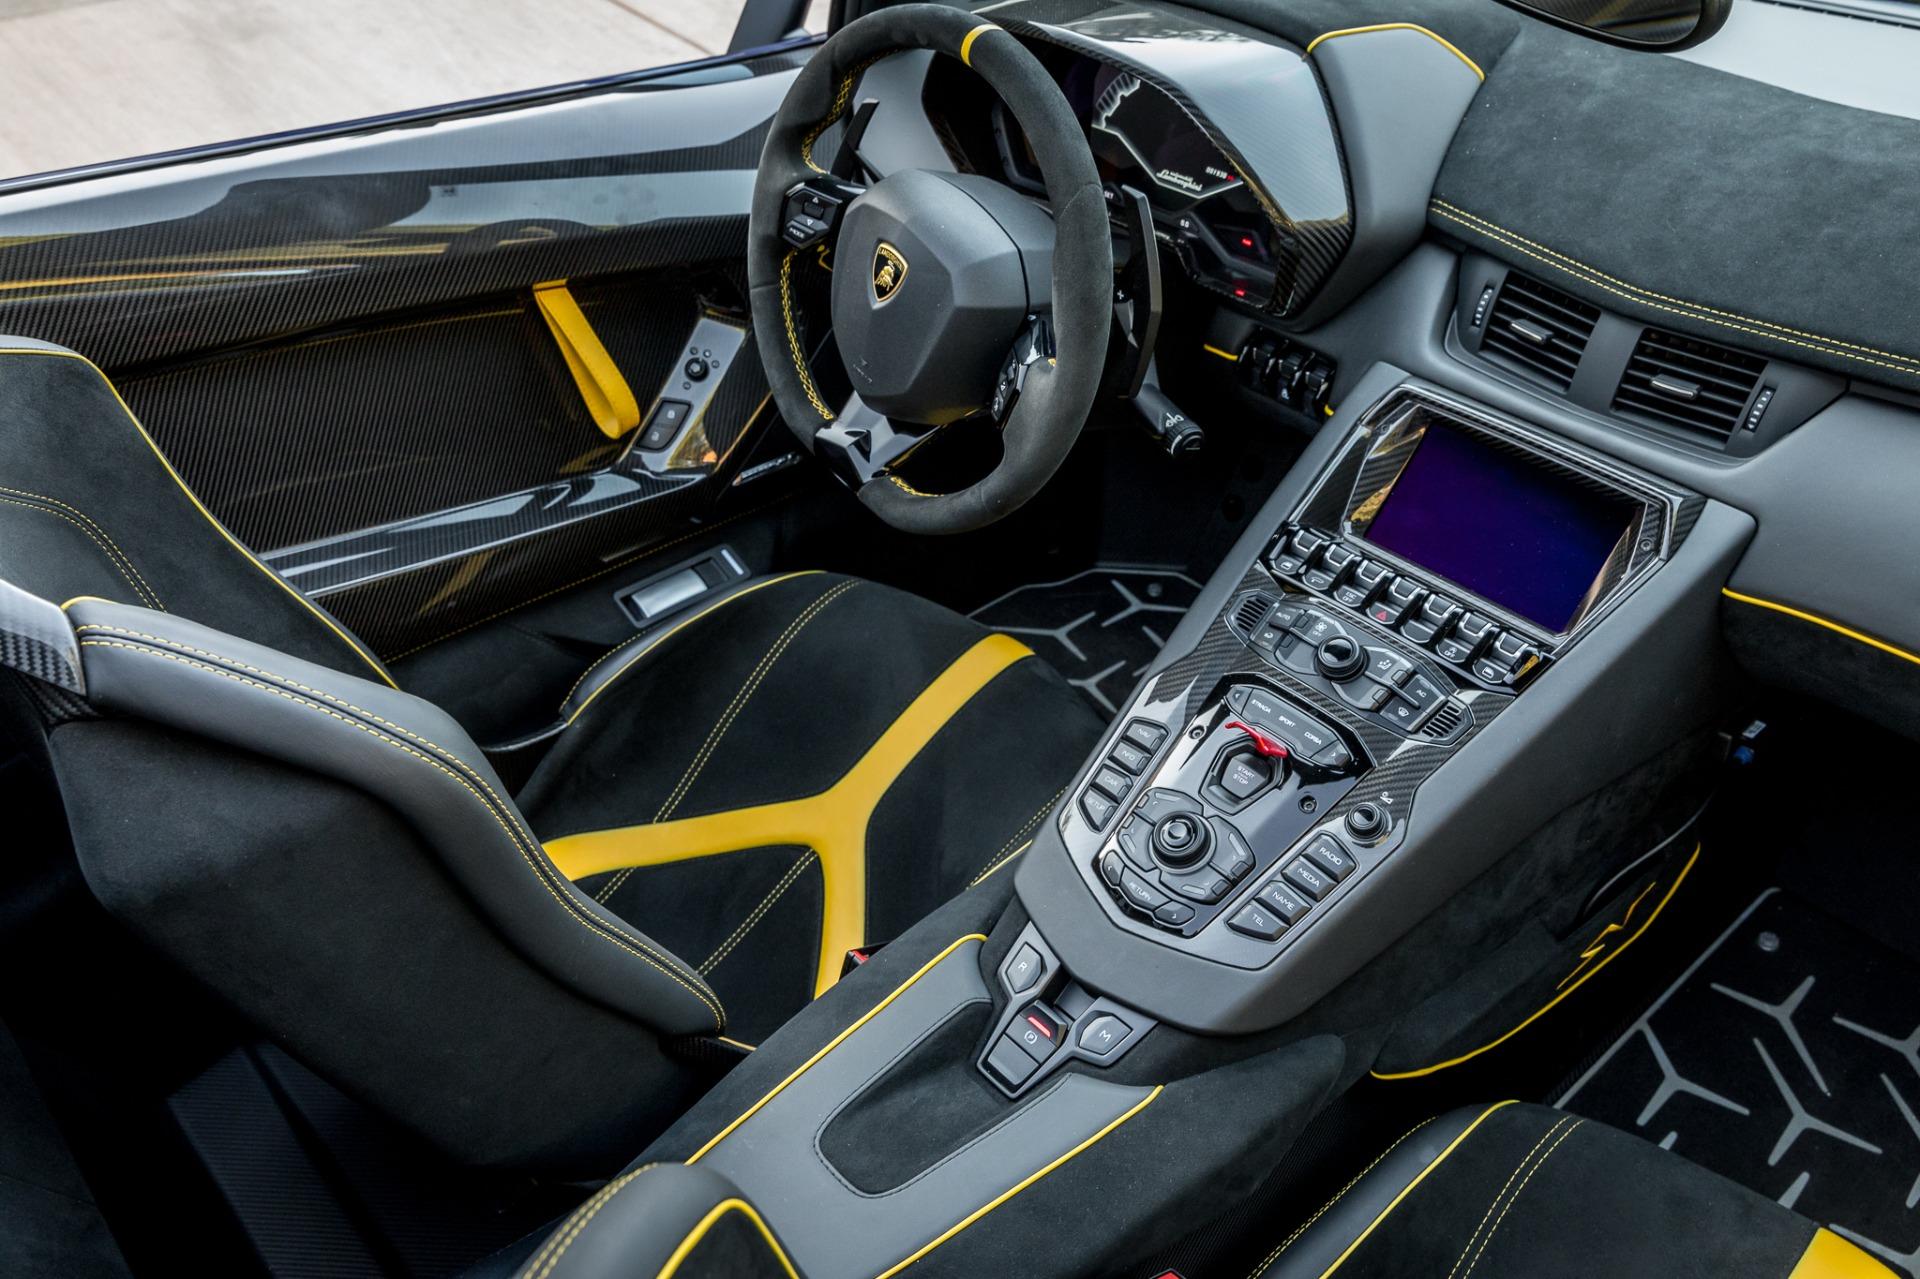 Used 2017 Lamborghini Aventador LP 750-4 SV / 740HP / AWD / 1930 MI / NAV / CAMERA for sale Sold at Formula Imports in Charlotte NC 28227 17